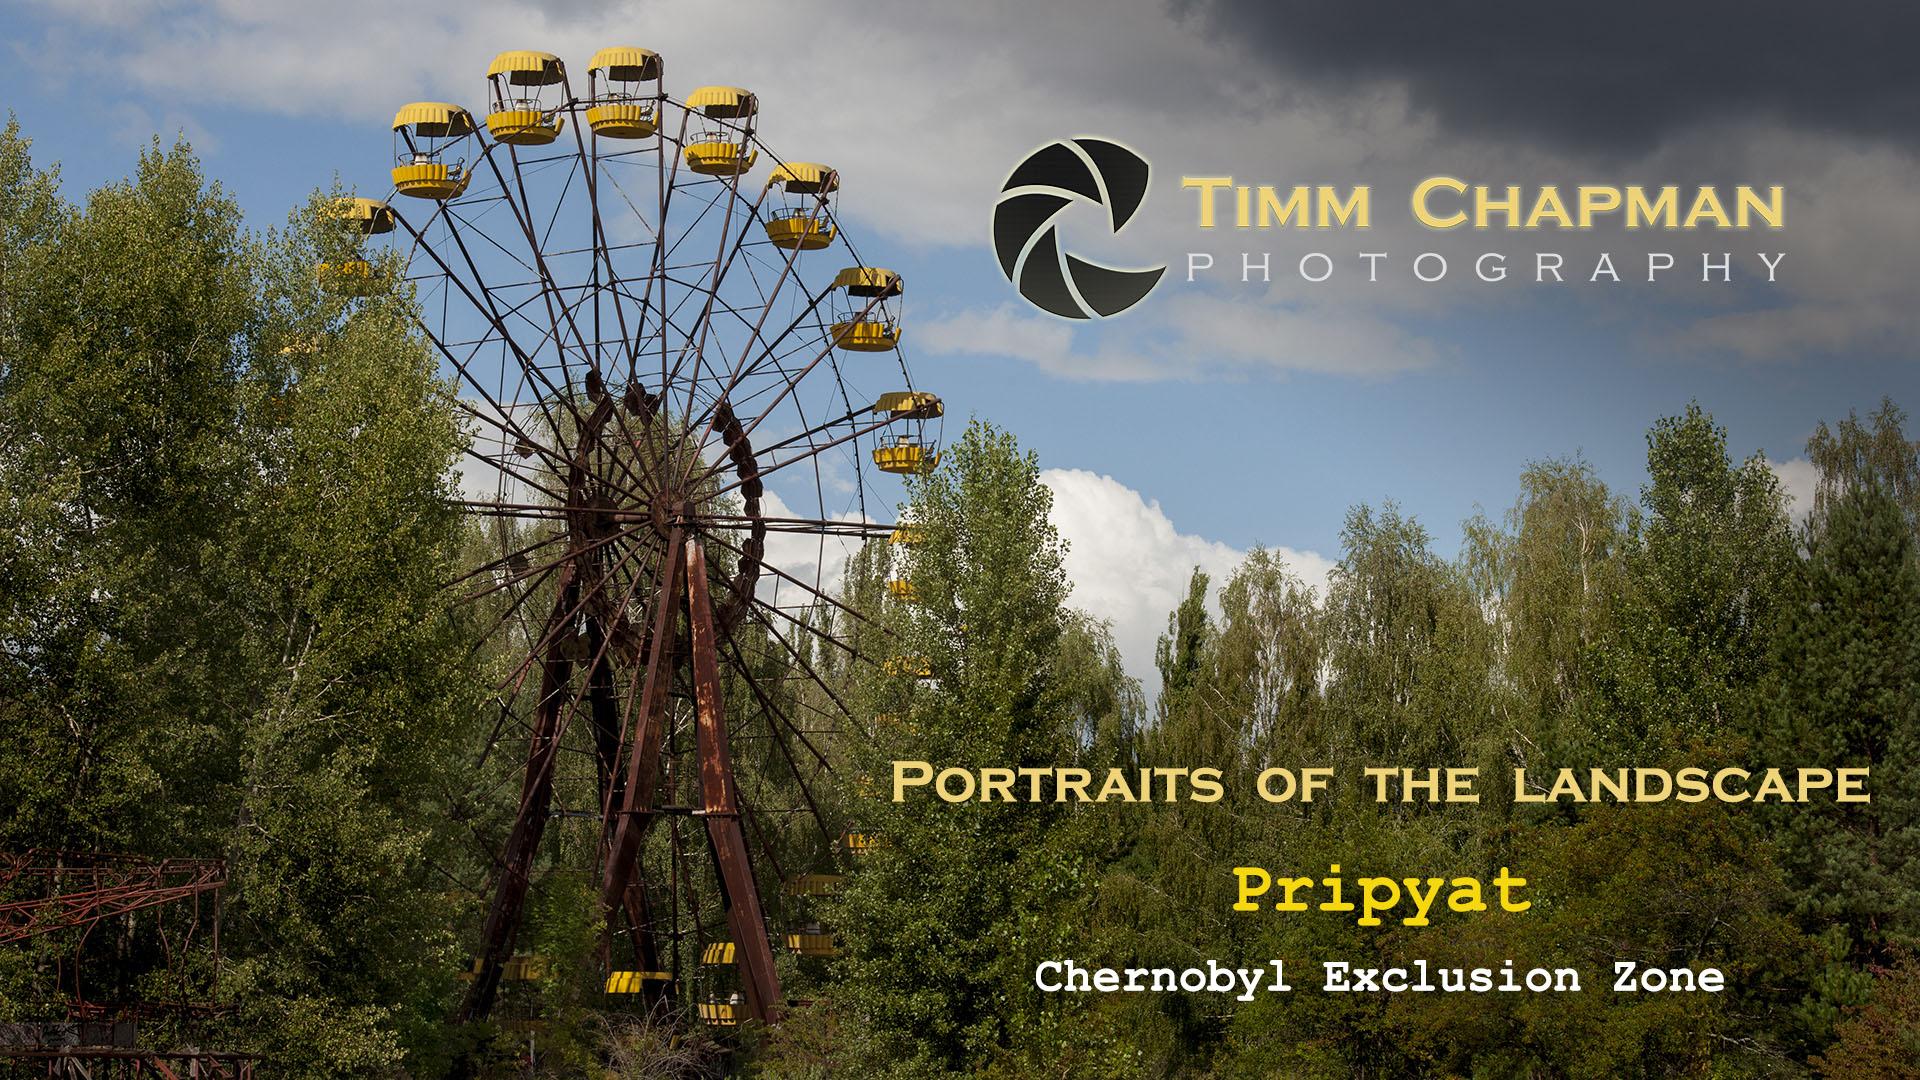 portraits of the landscape, chernobyl, exclusion zone, pripyat, chernobyl nuclear power plant, portraits, video, movie, photo